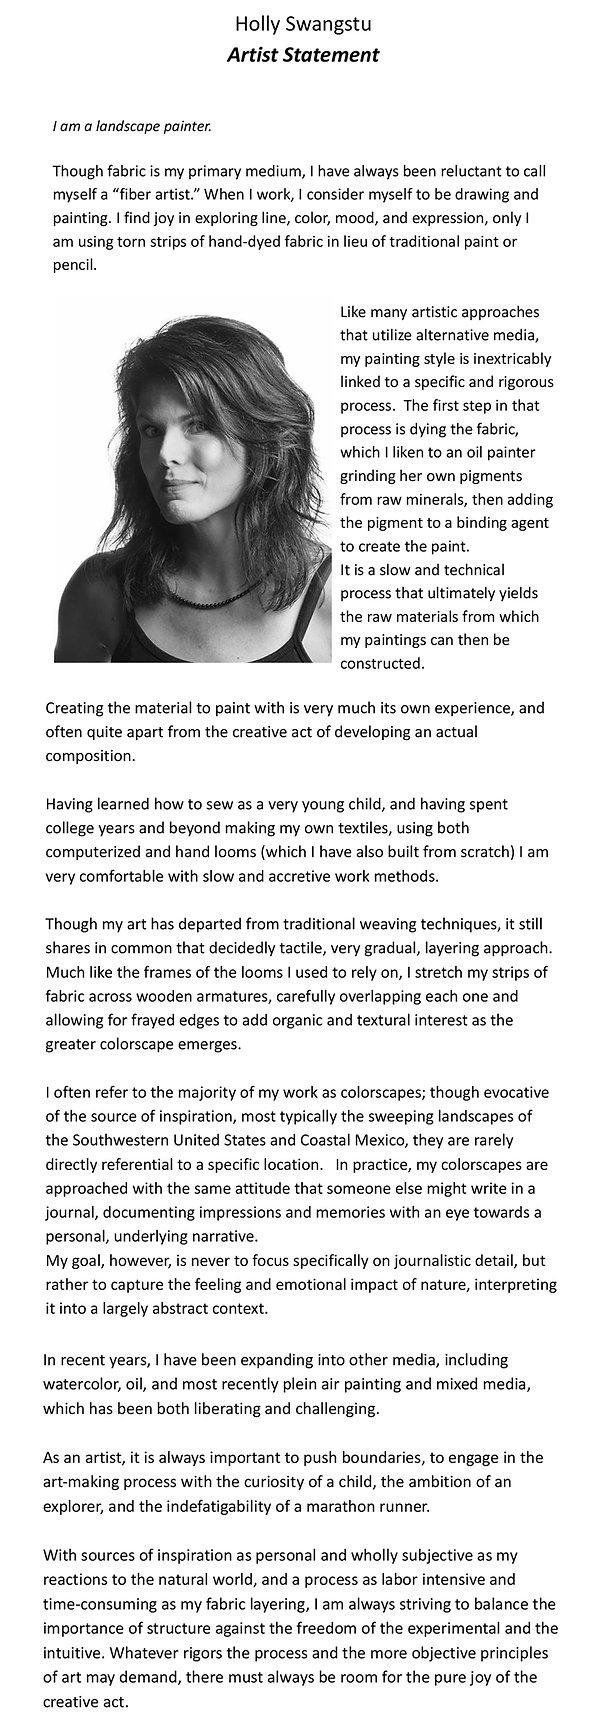 Holly Swangstu Artist Statement long statement.jpg